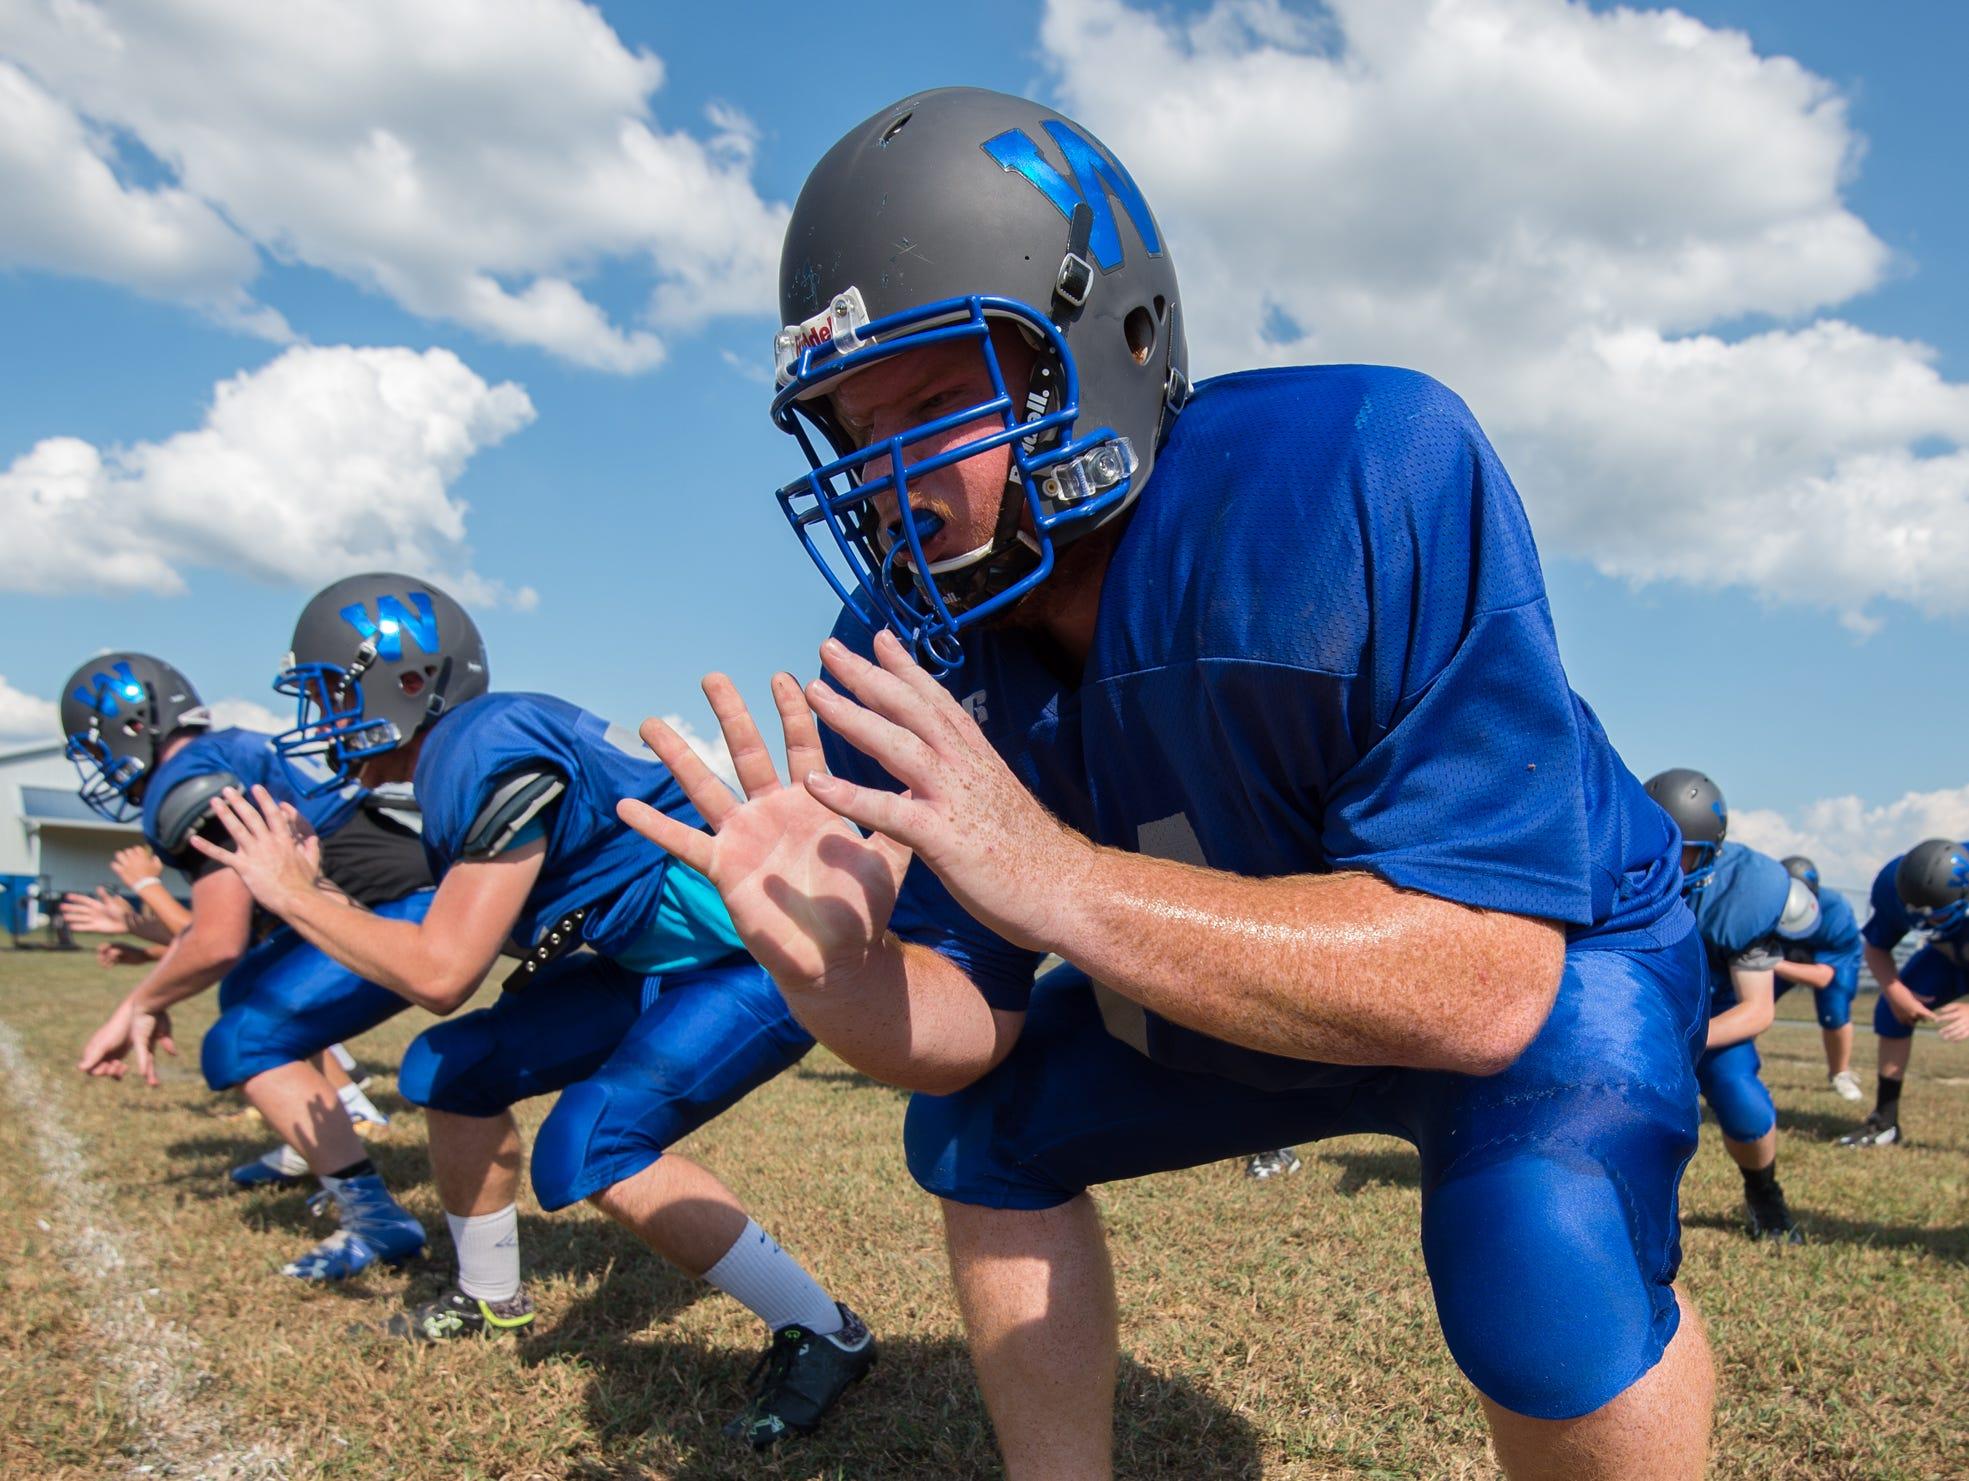 Woodbridge High School football linemen Brian Ireland runs linemen drills at practice.